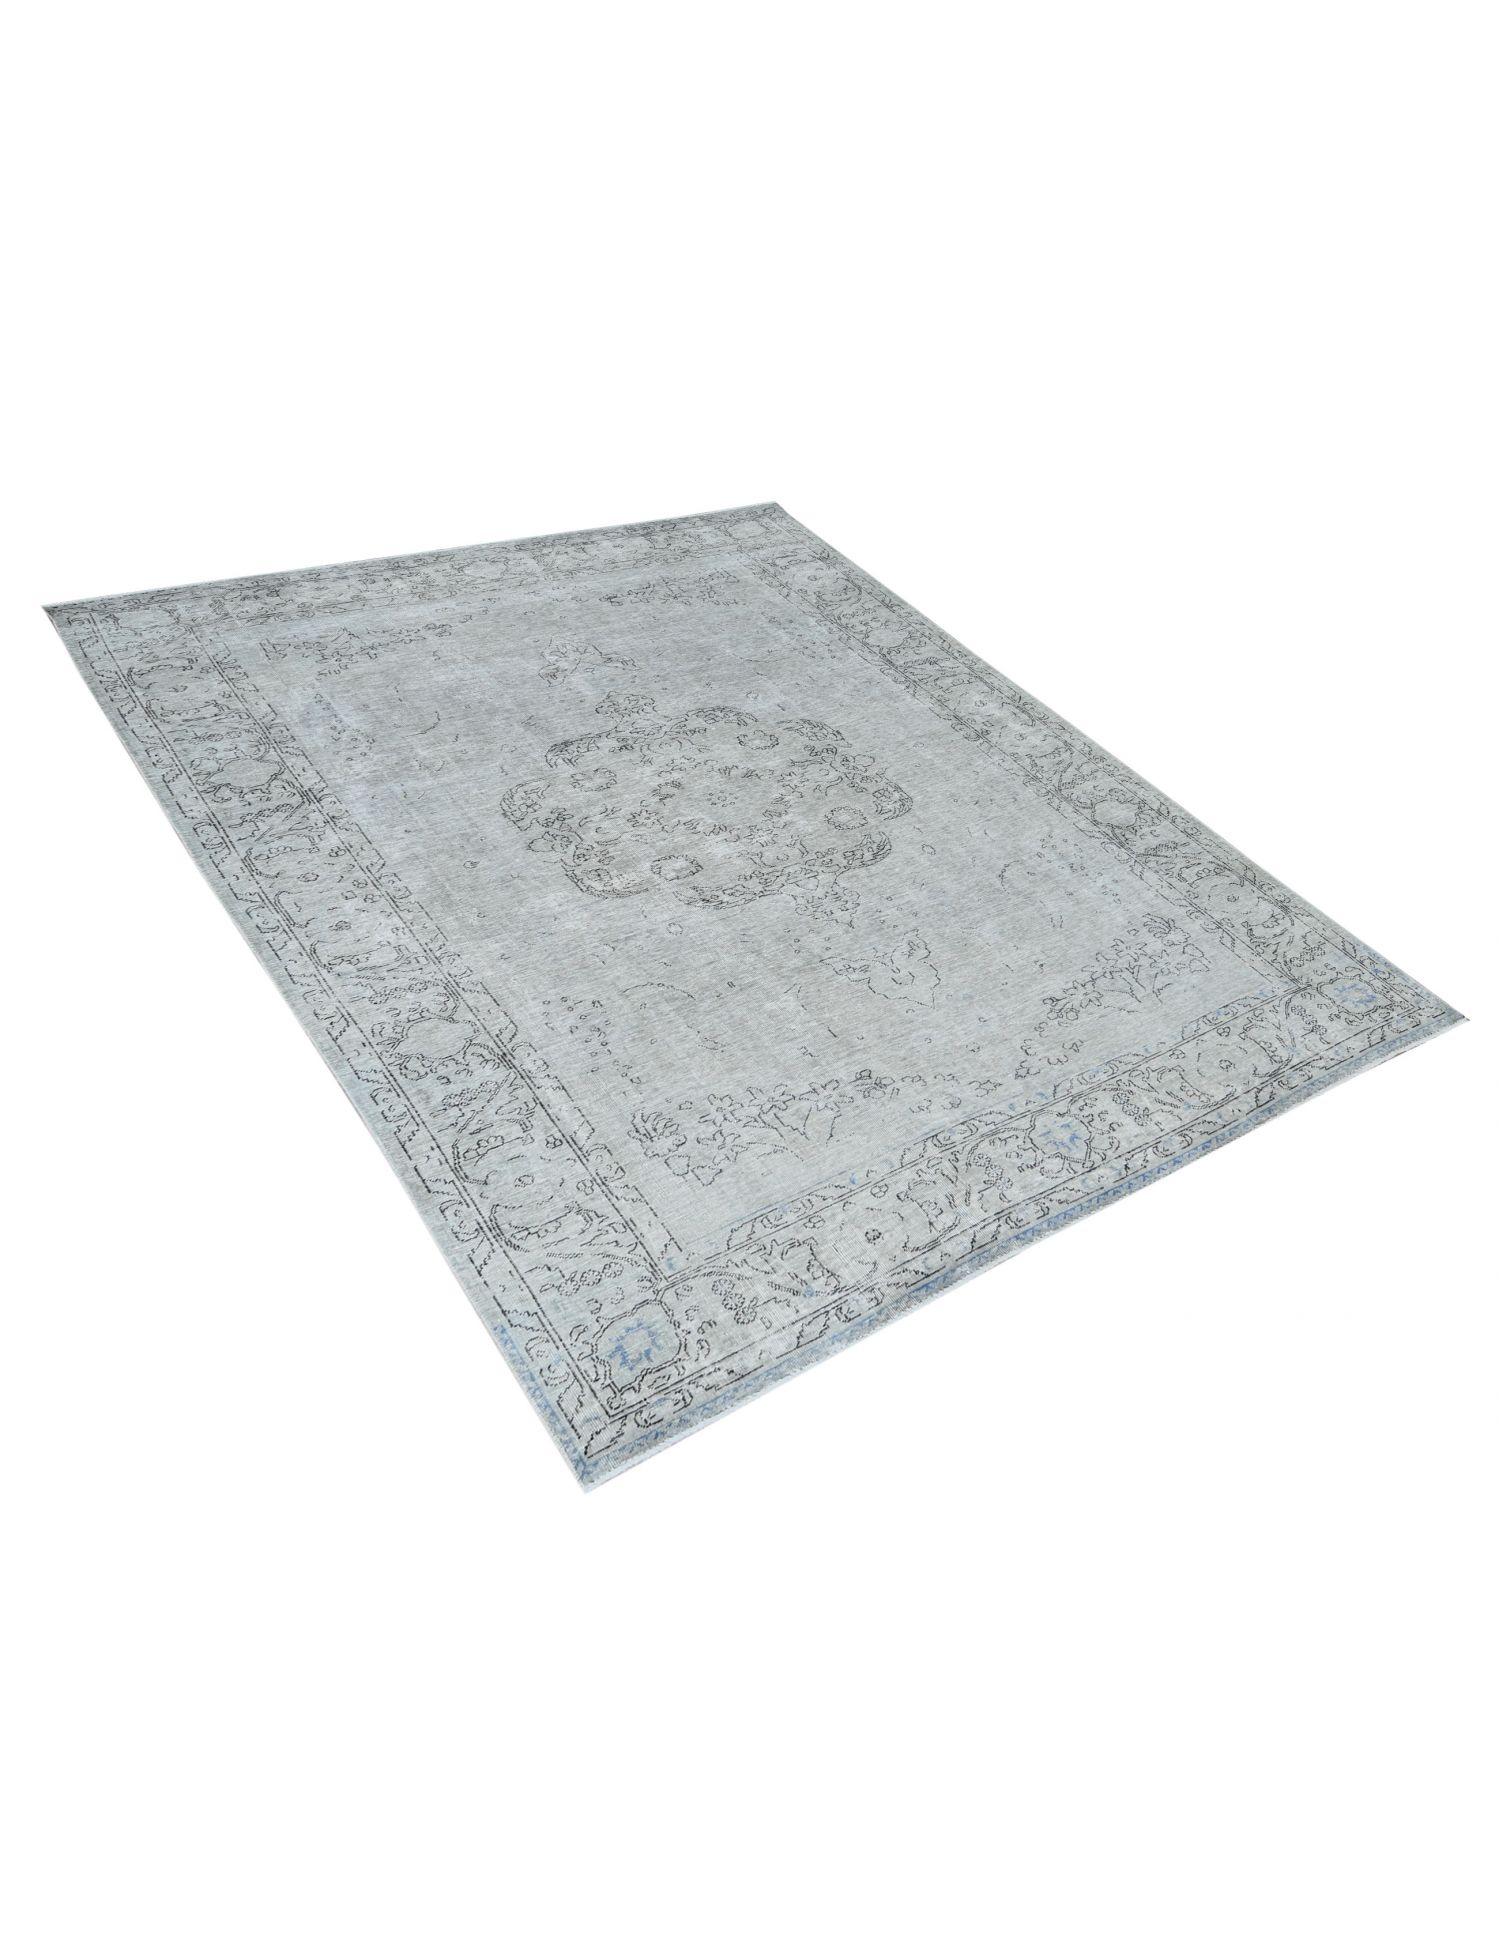 Vintage Teppich  grau <br/>297 x 193 cm